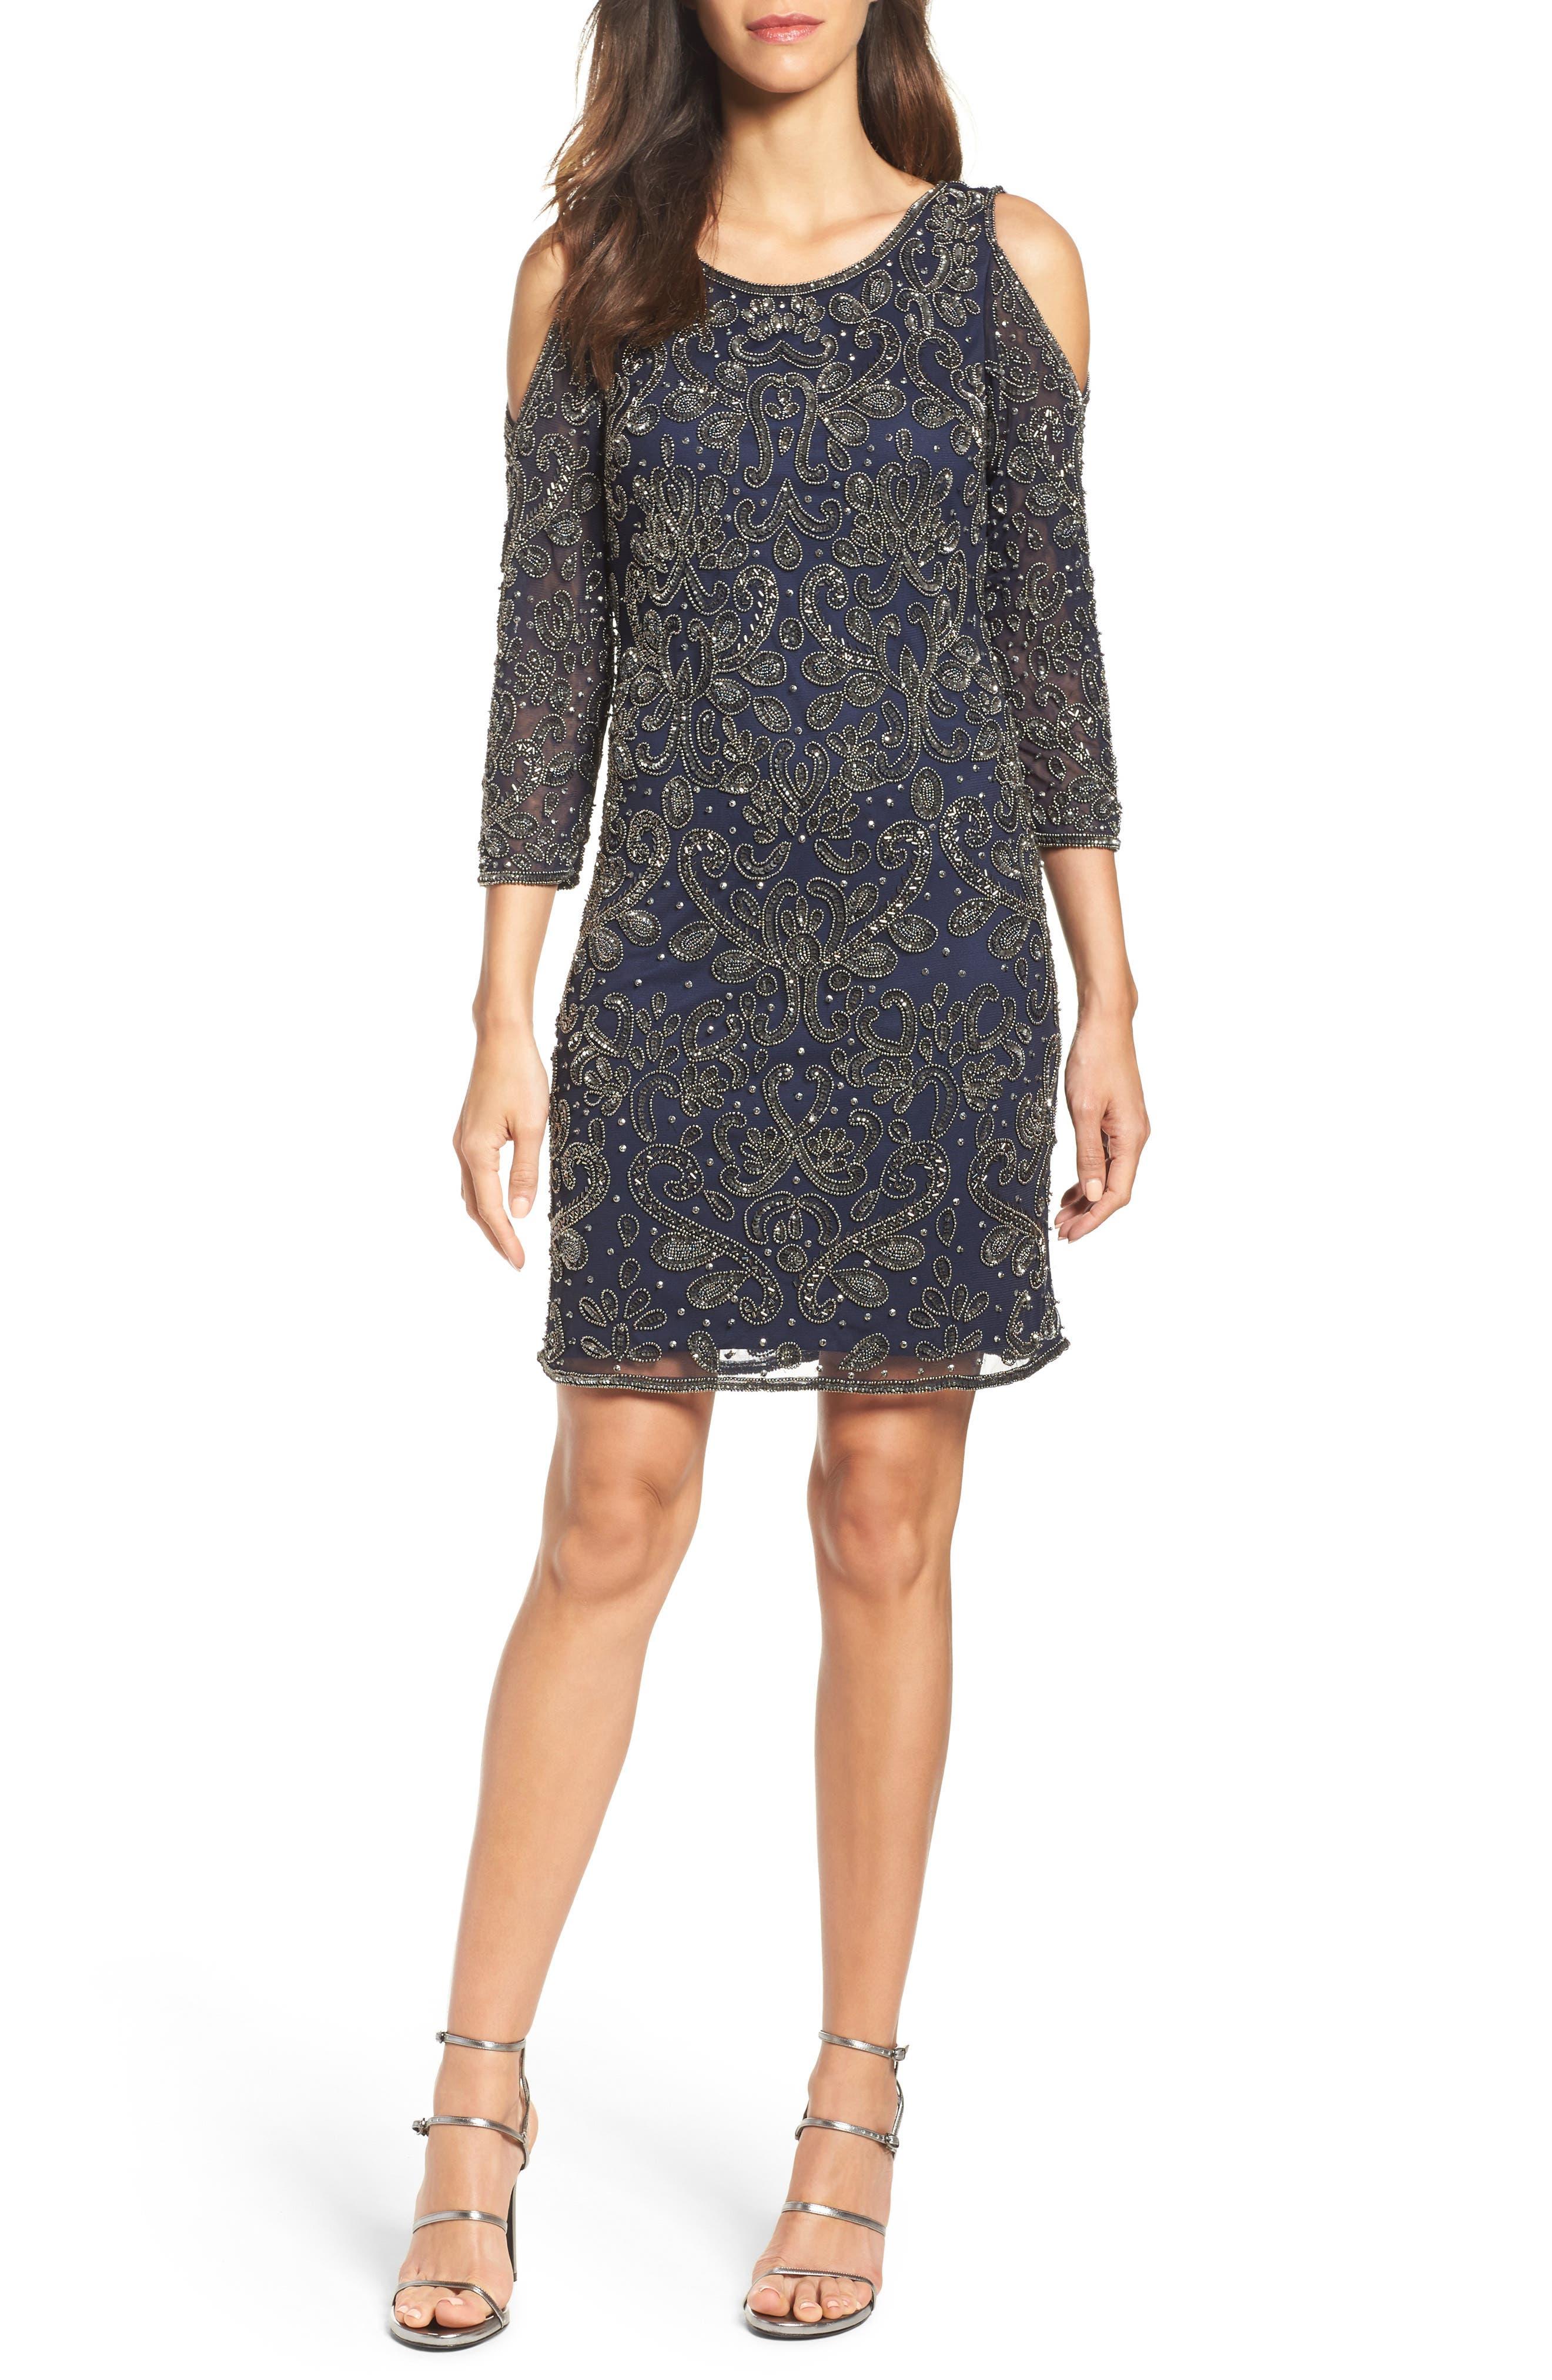 Alternate Image 1 Selected - Pisarro Nights Embellished Mesh Sheath Dress